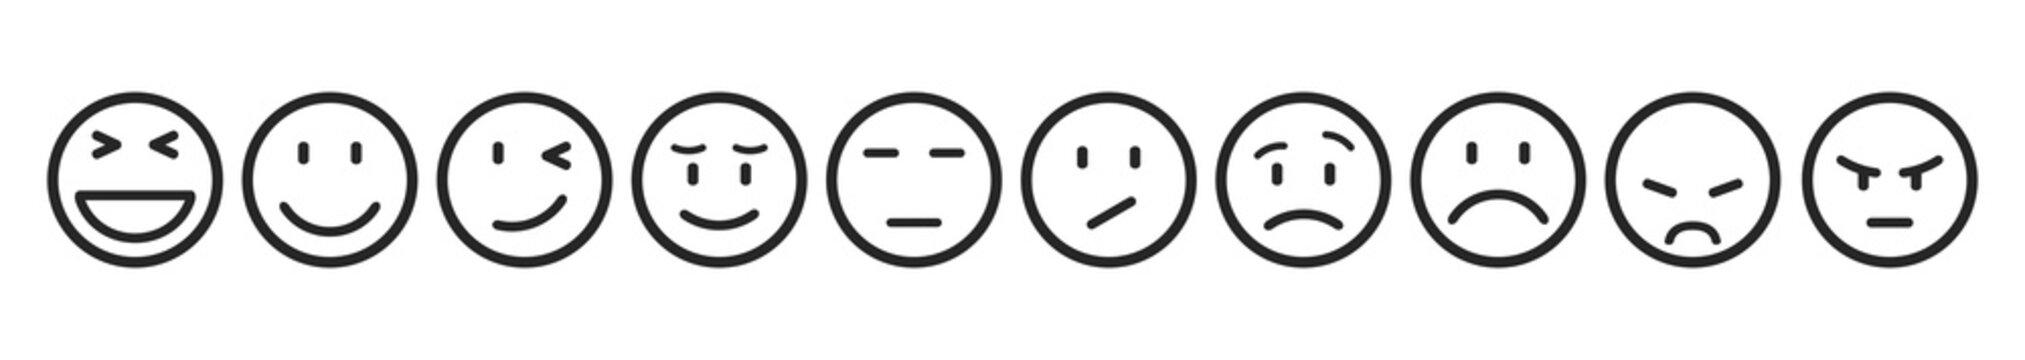 Ten smilies, set smiley emotion, by smilies, cartoon emoticons - stock vector